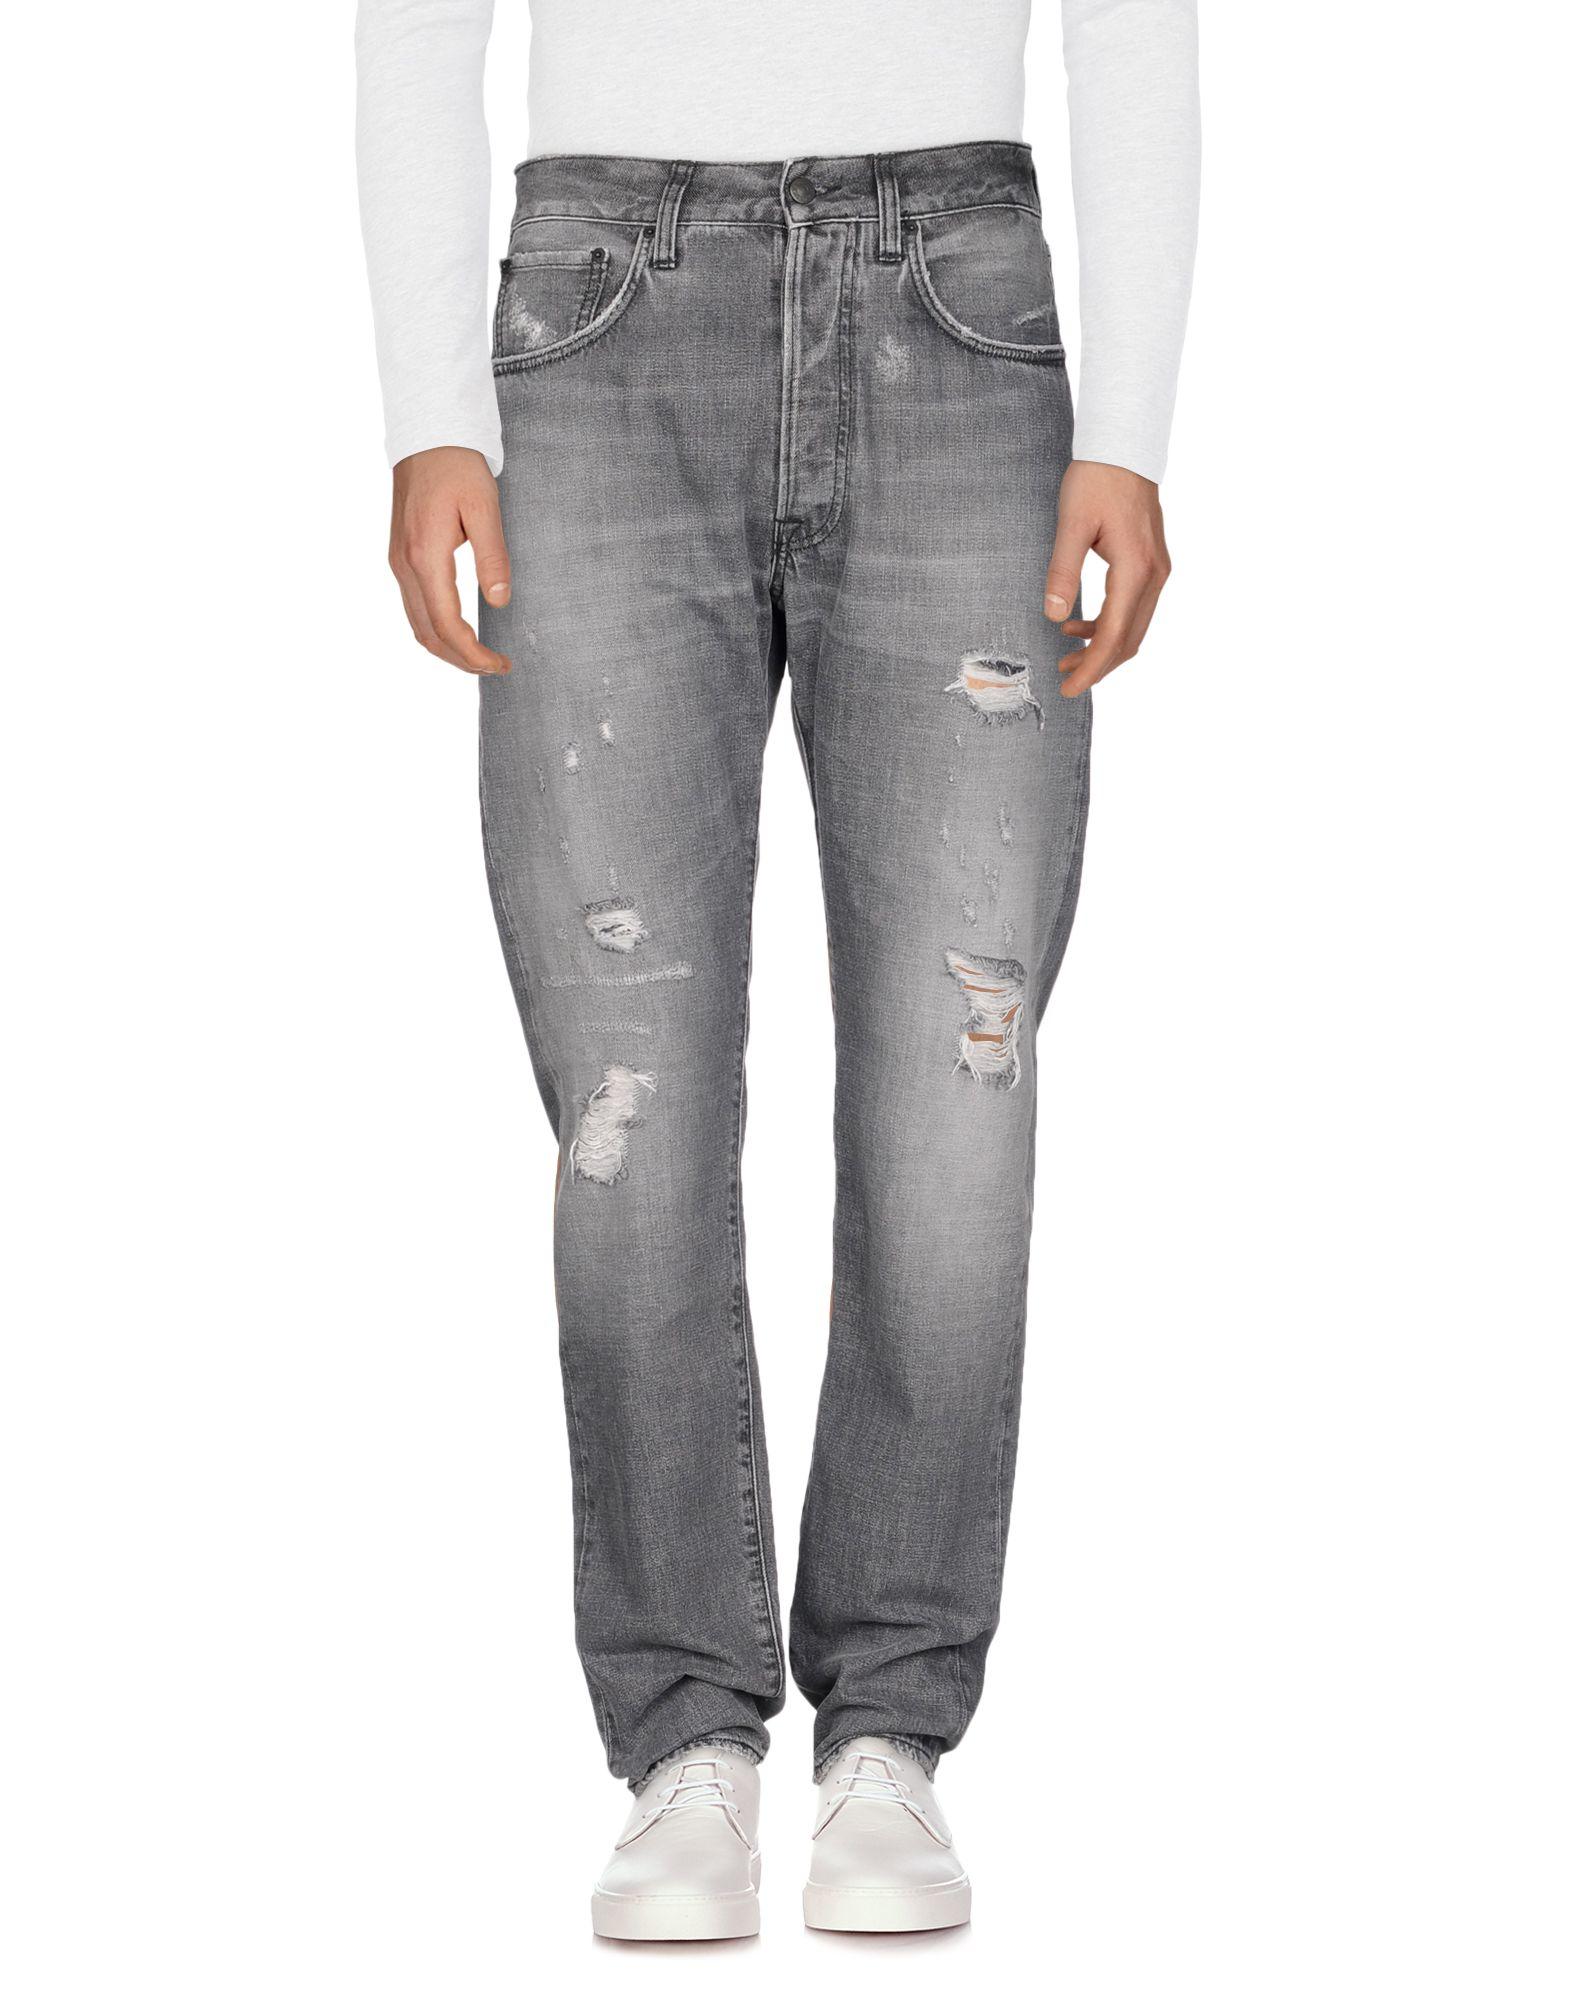 Pantaloni Jeans (+) 42683130OP People Uomo - 42683130OP (+) 852646